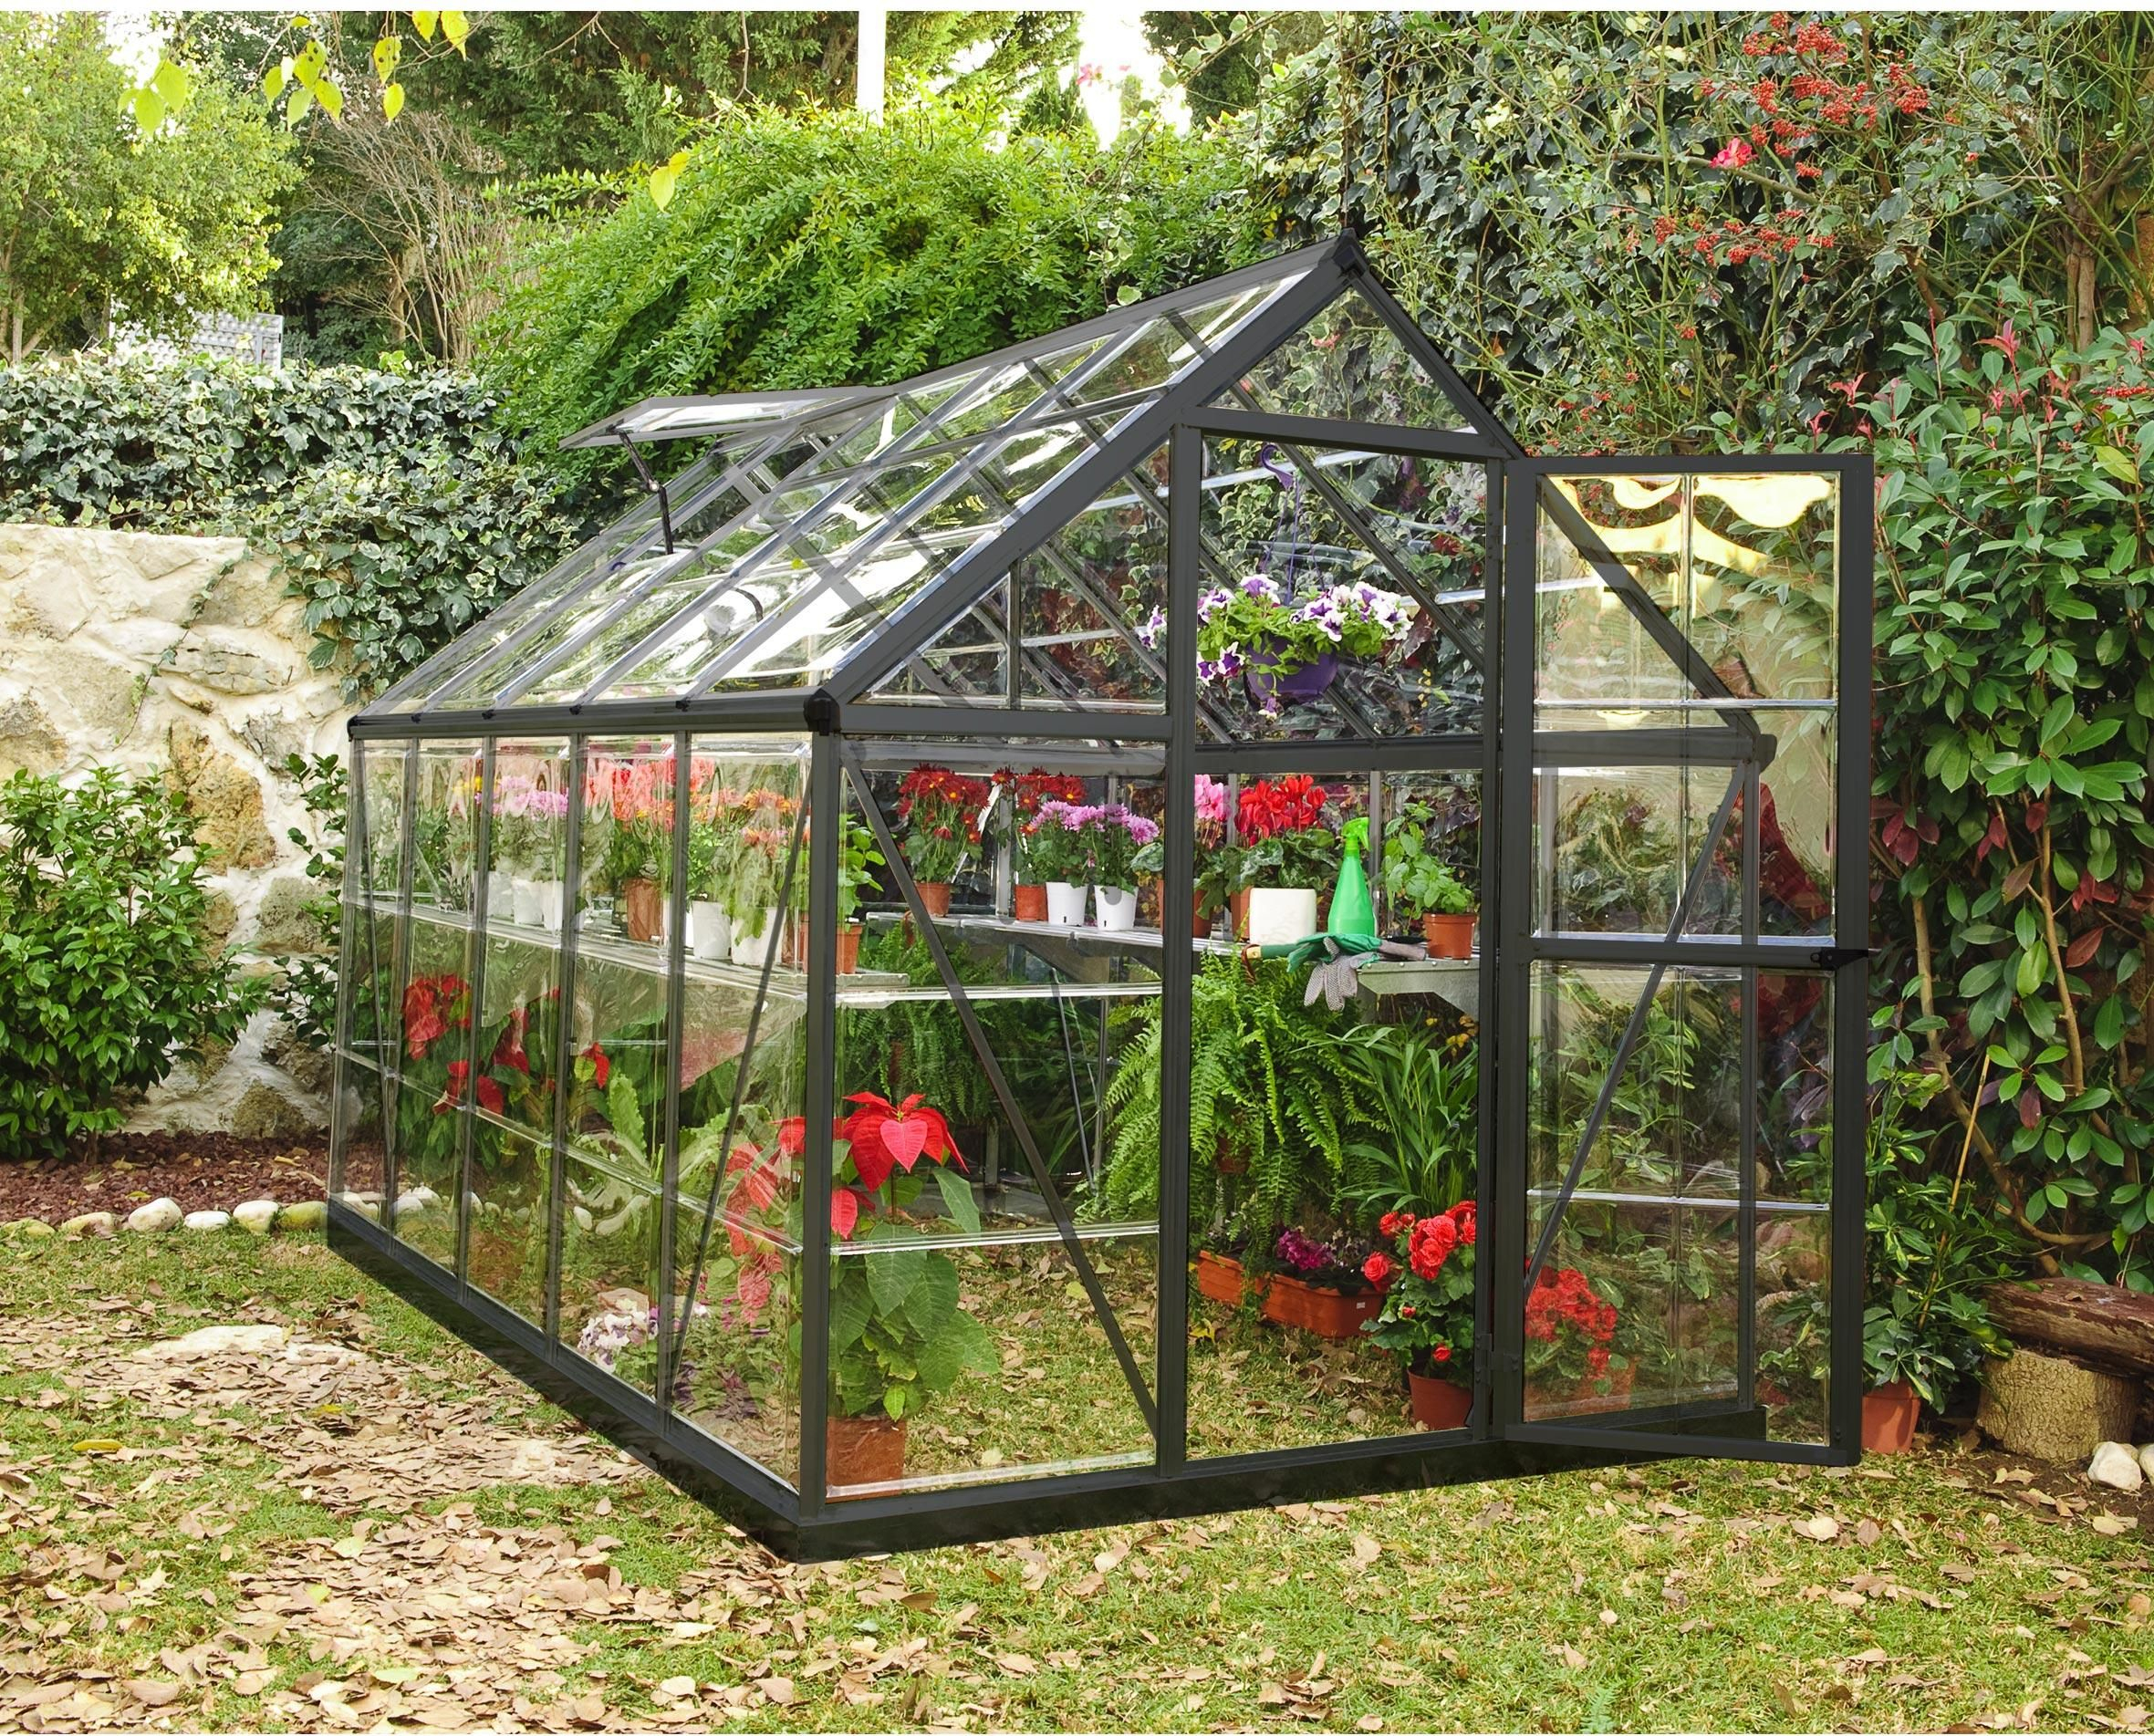 Serre De Jardin Alu Et Polycarbonate Palram Harmony, 5.6 M² ... encequiconcerne Serres De Jardin Leroy Merlin